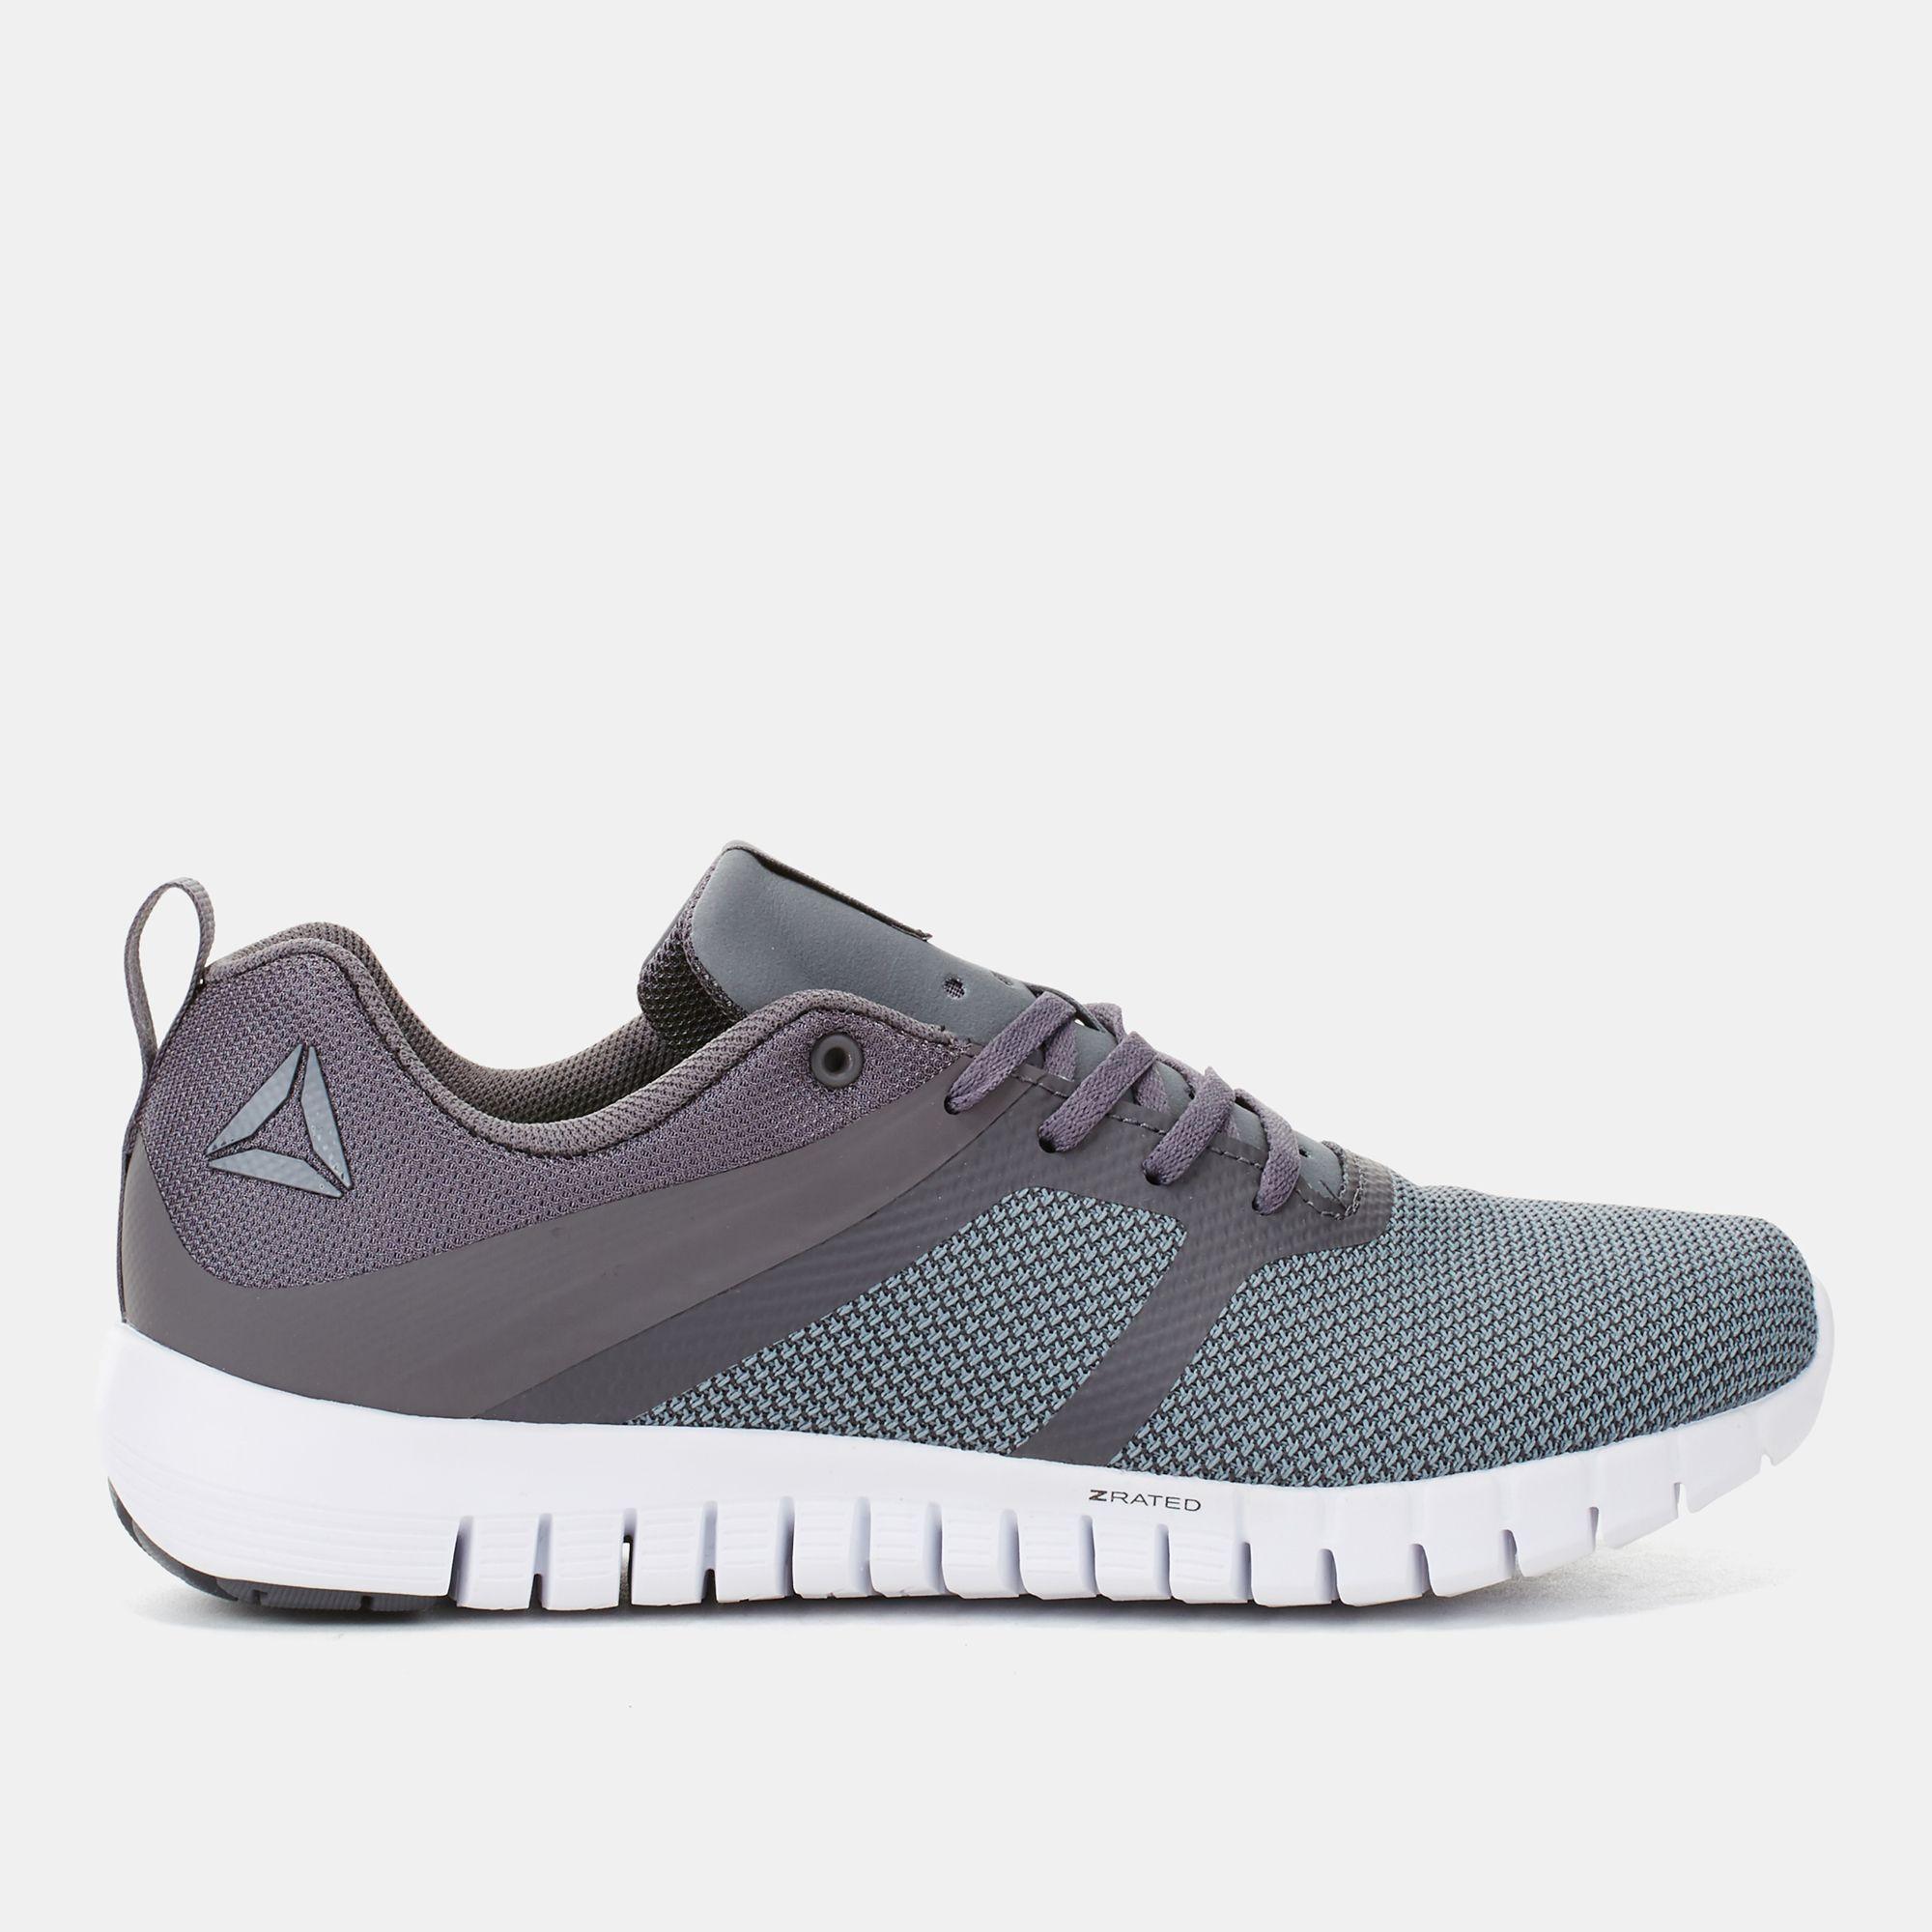 1acc8caba877 Reebok ZQuick Lite 2.0 Shoe